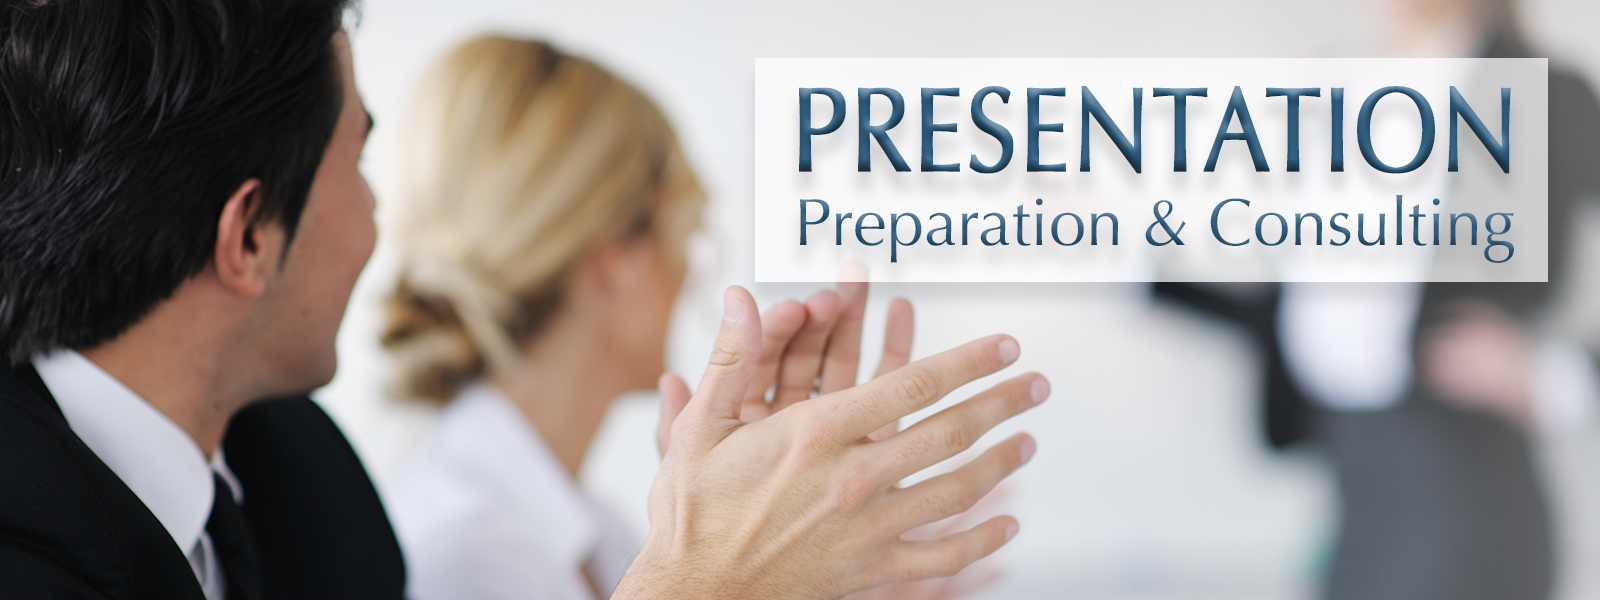 Camelot Enterprises, LLC - est. 1994 | Presentation Preparation, Training and Consultations